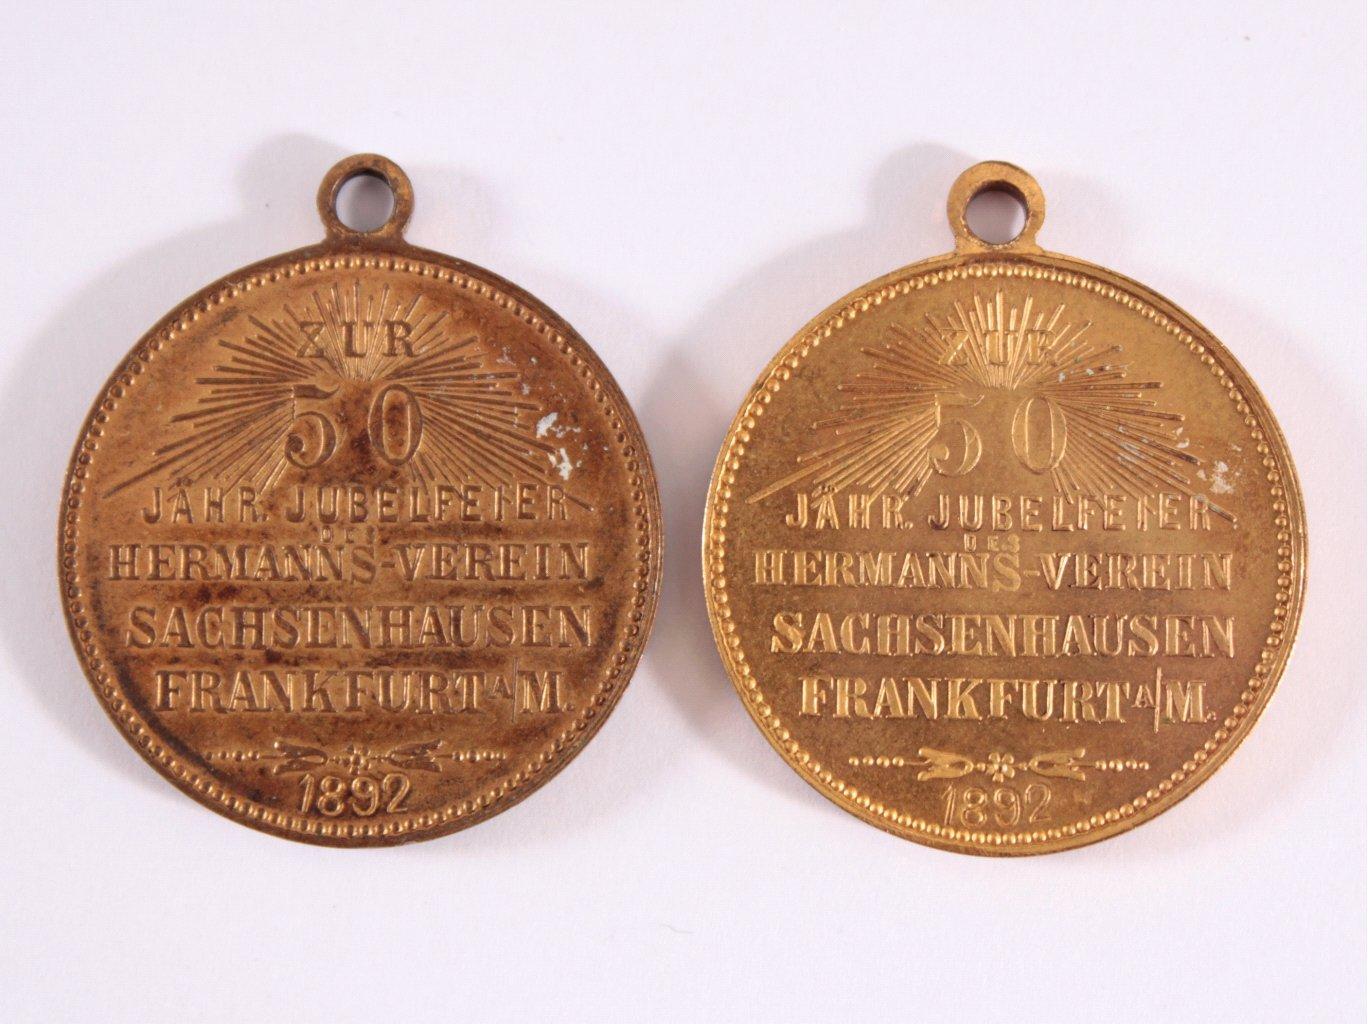 2 Medaillen 50 jährigen Feier, Herrmanns Verein, Frankfurt-1